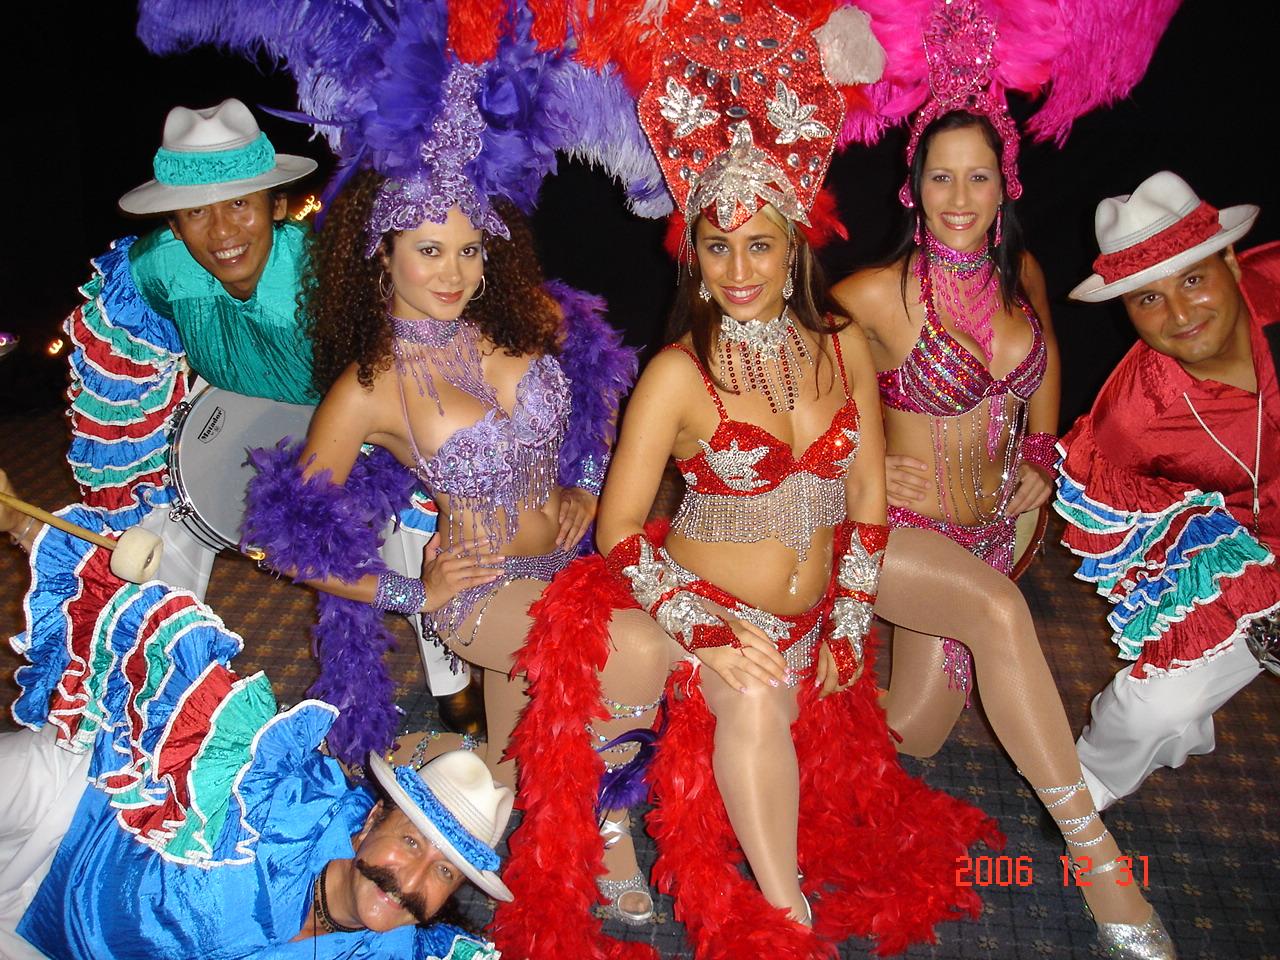 Cuba Brazil Carnaval